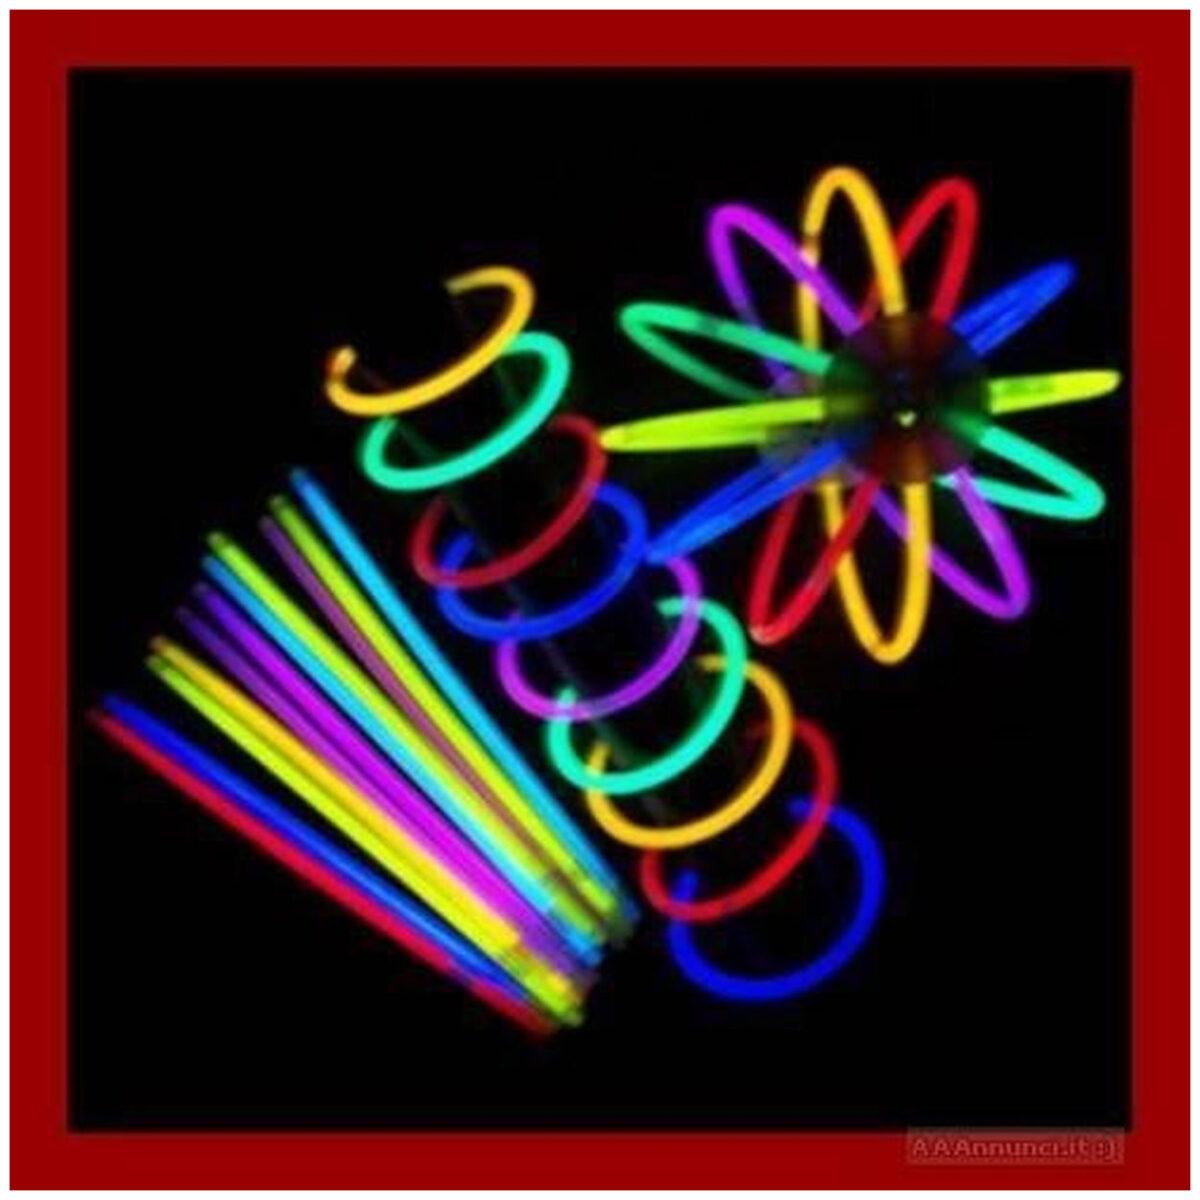 OFFERTA Braccialetti Glow-sticks 100pz multicolore